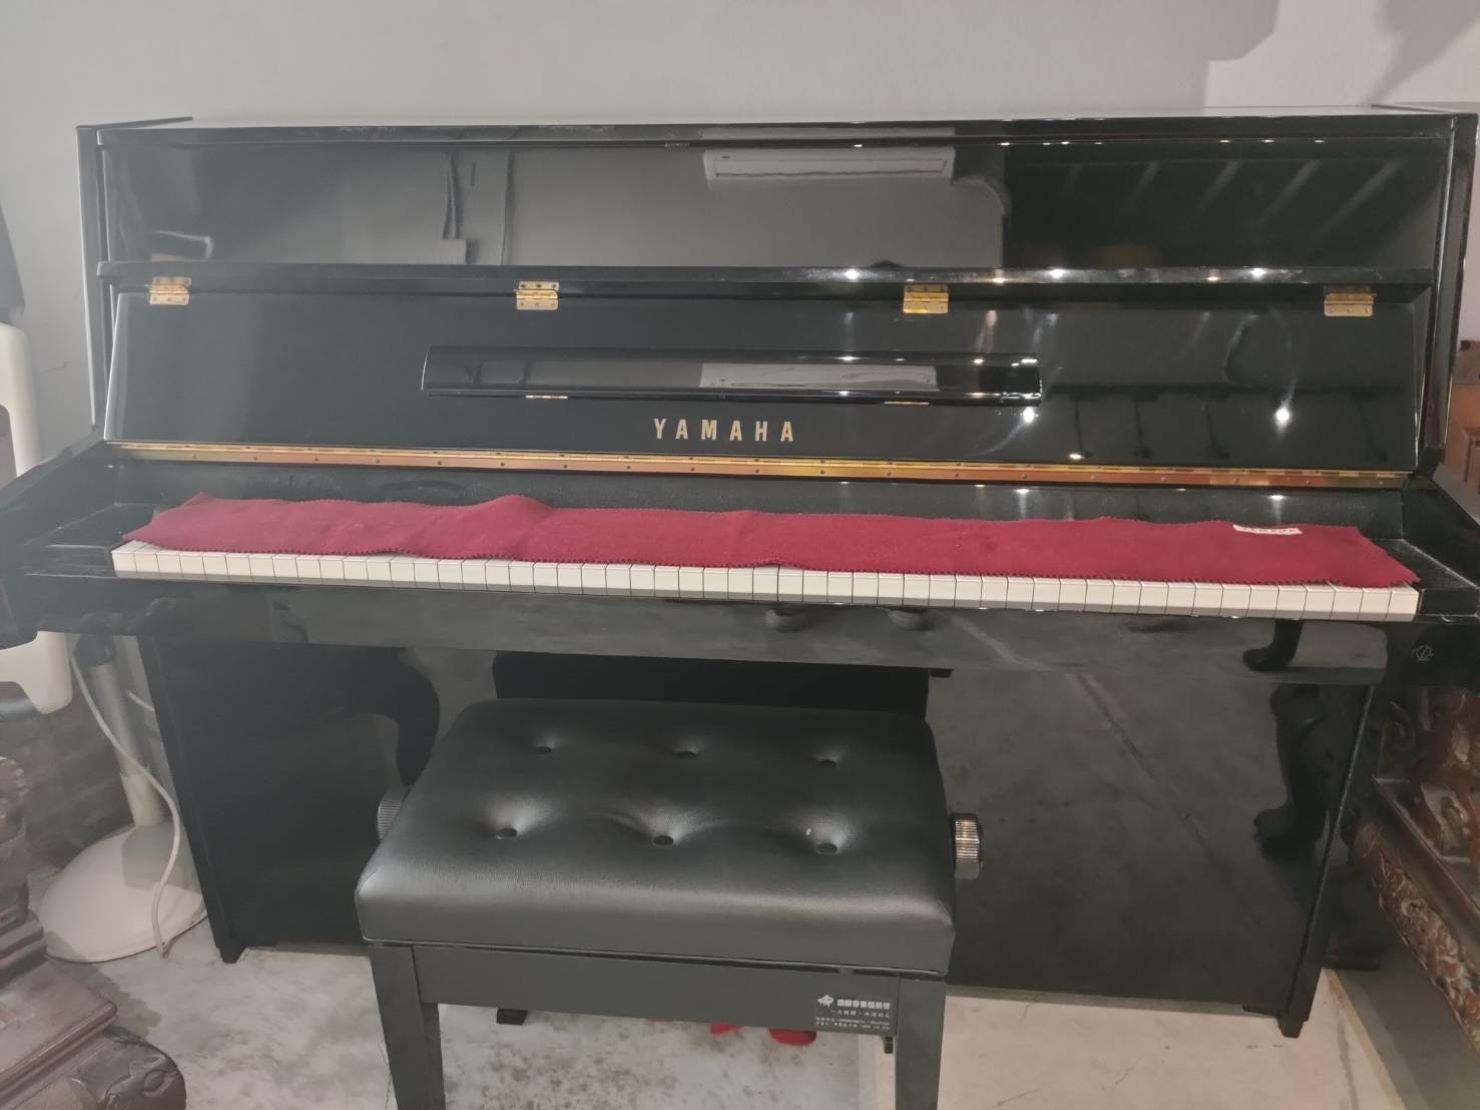 YAMAHA山葉鋼琴搬運【榮福搬家】精搬鋼琴、最專業、最細心的搬運服務,搬鋼琴口碑第一